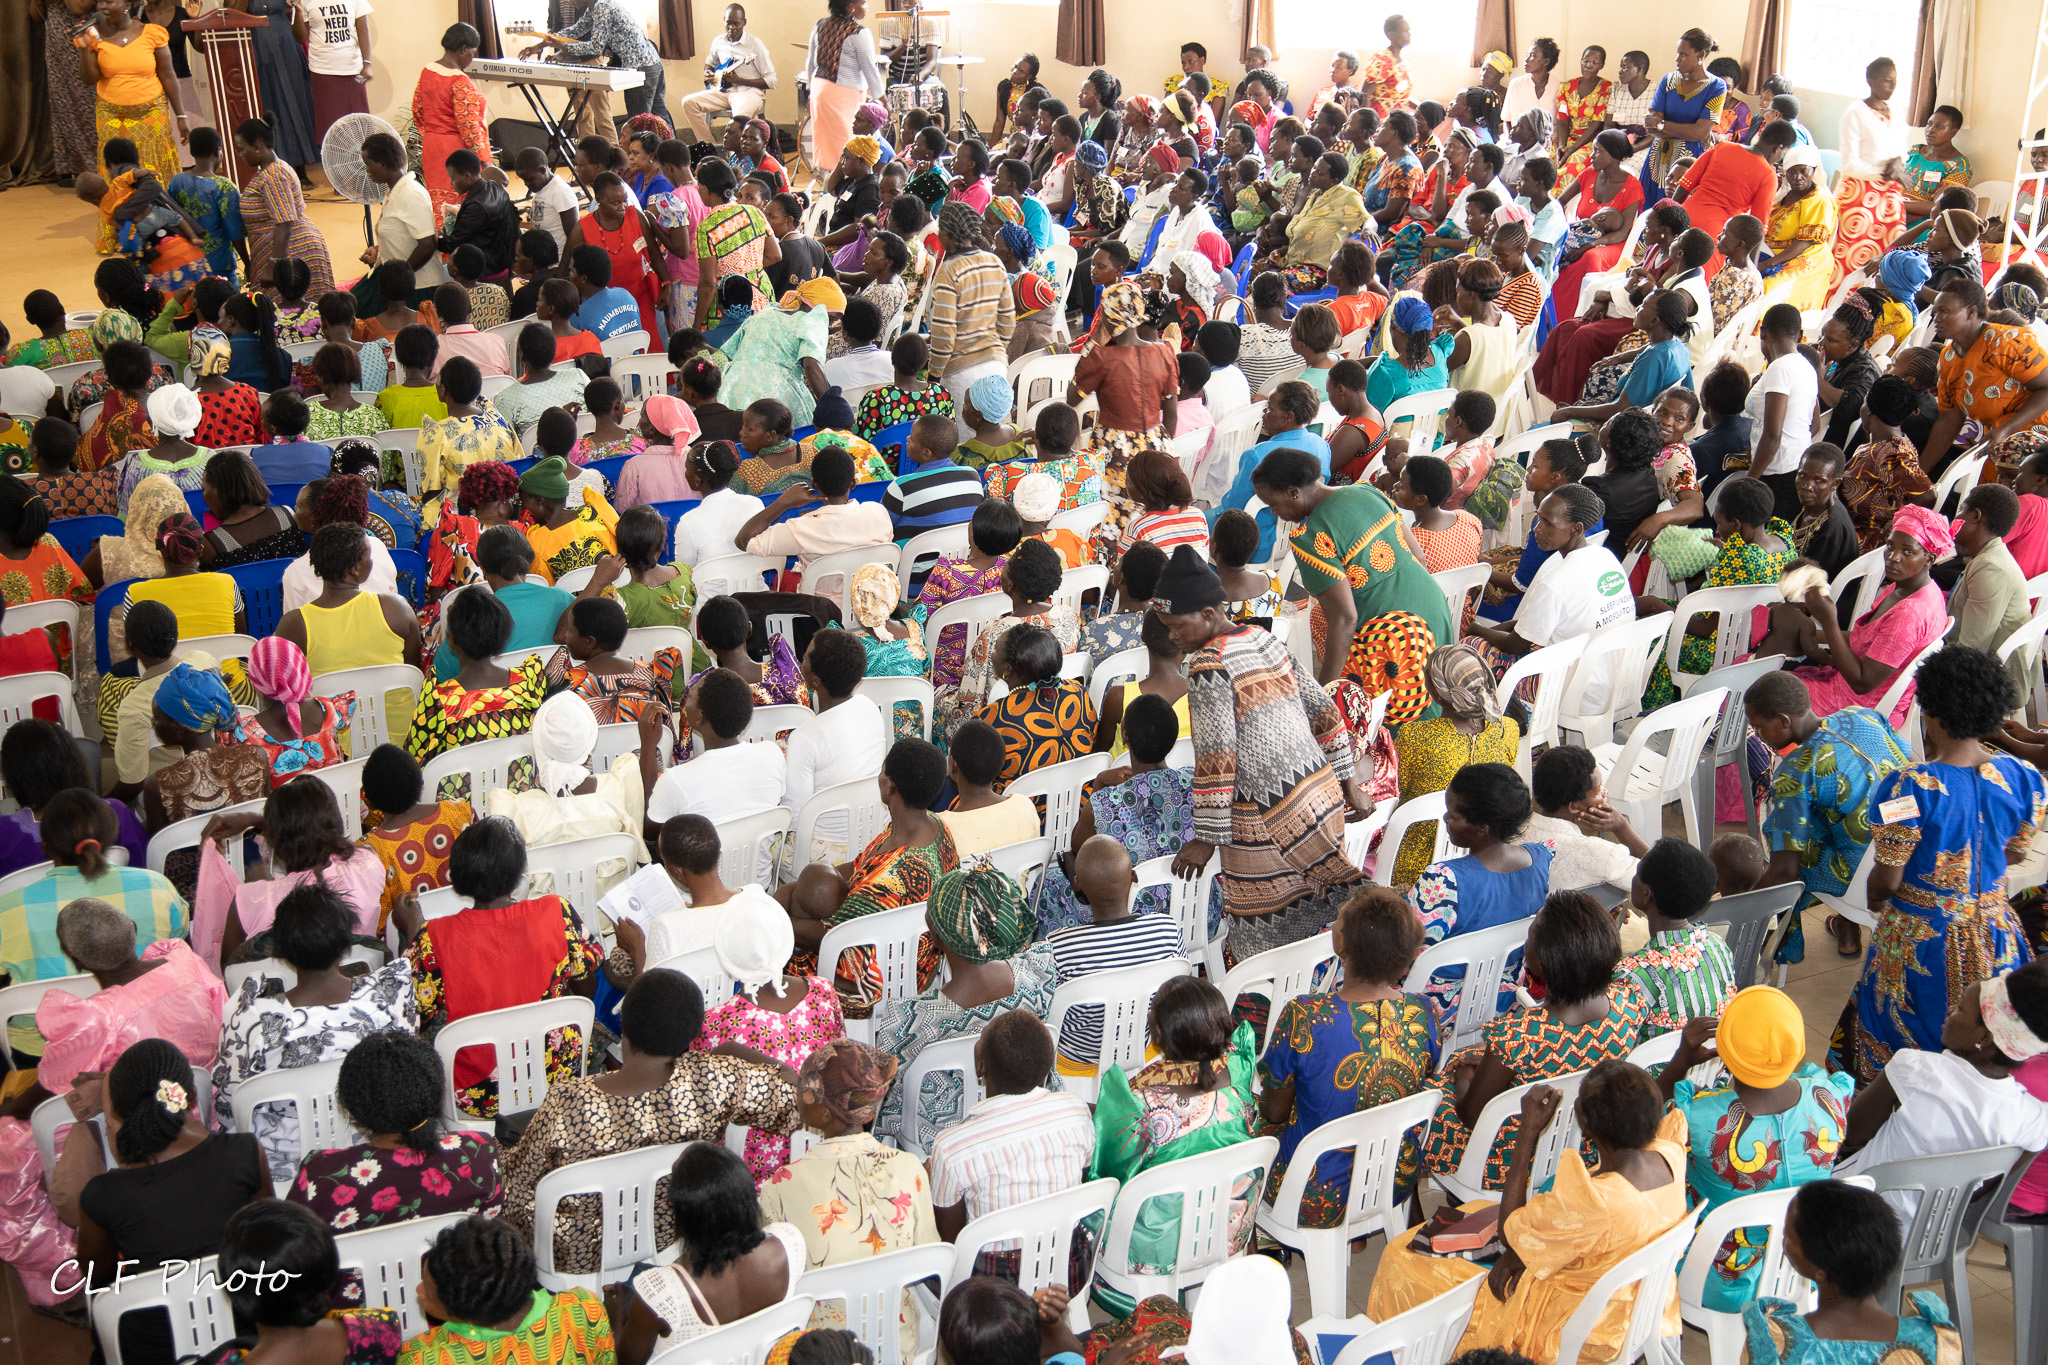 Esther-initiative-uganda-crowd.JPG